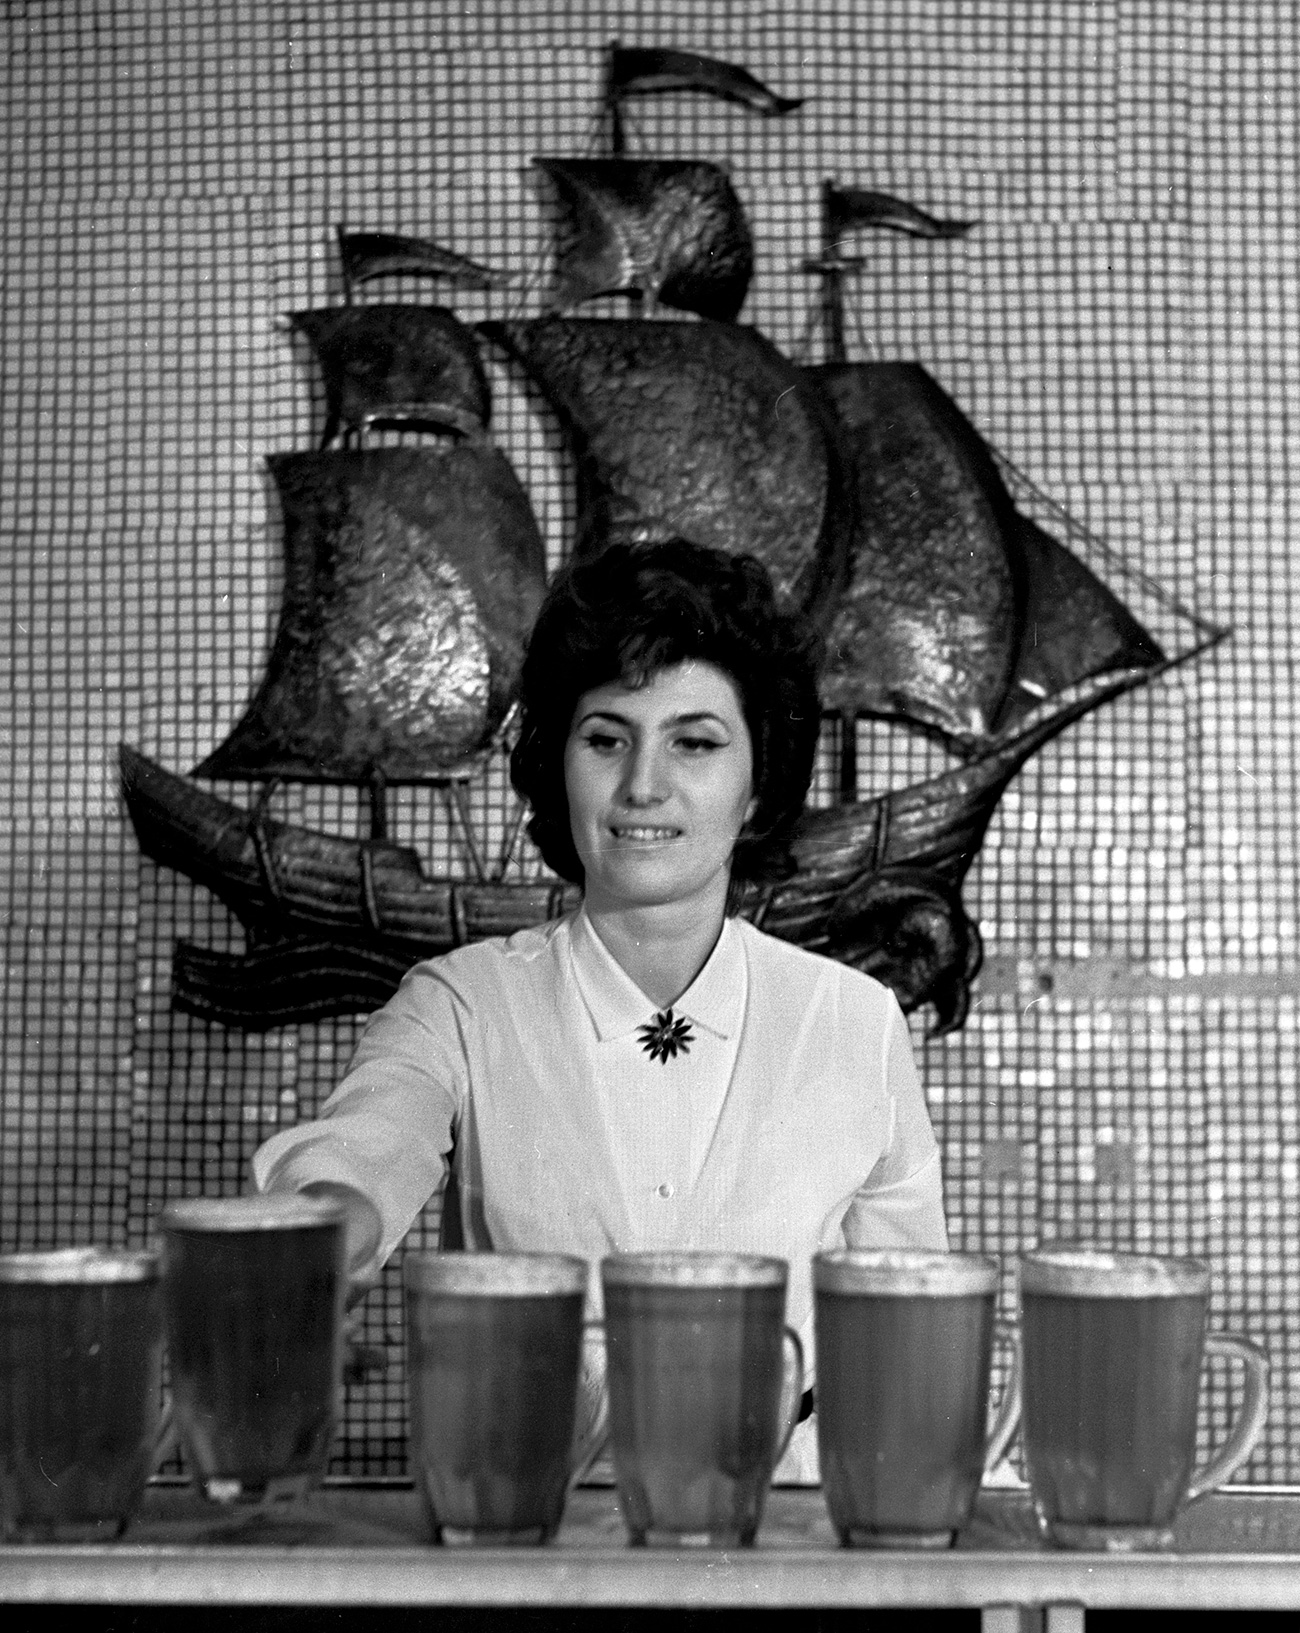 Natakarica v baru Gambrinus, 1967. Vir: RIA Novosti